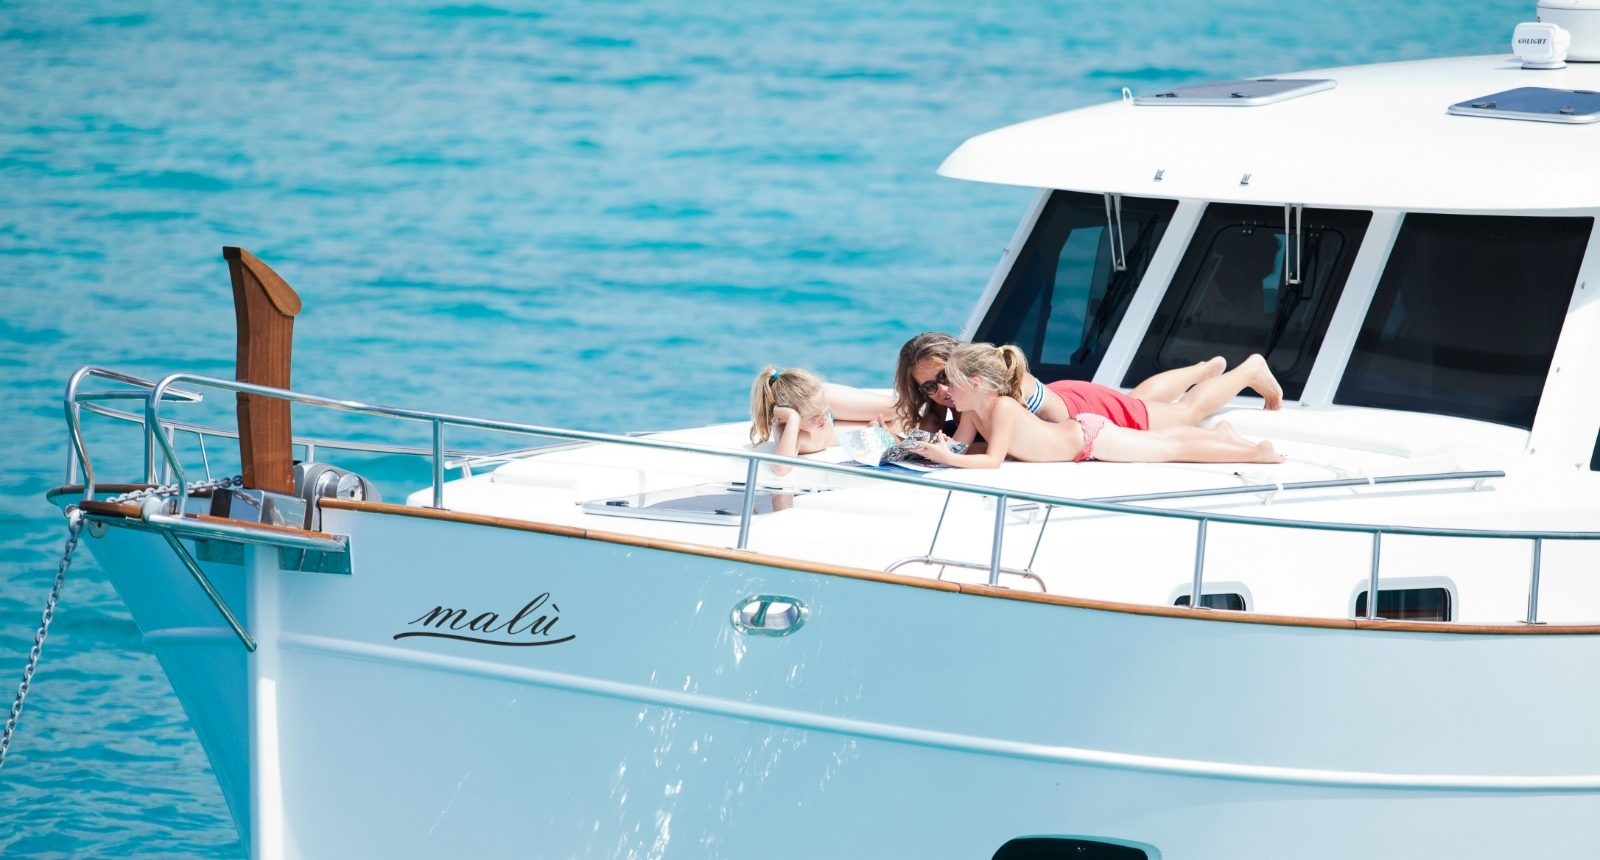 Minorca Islander 42 yacht for sale - bow